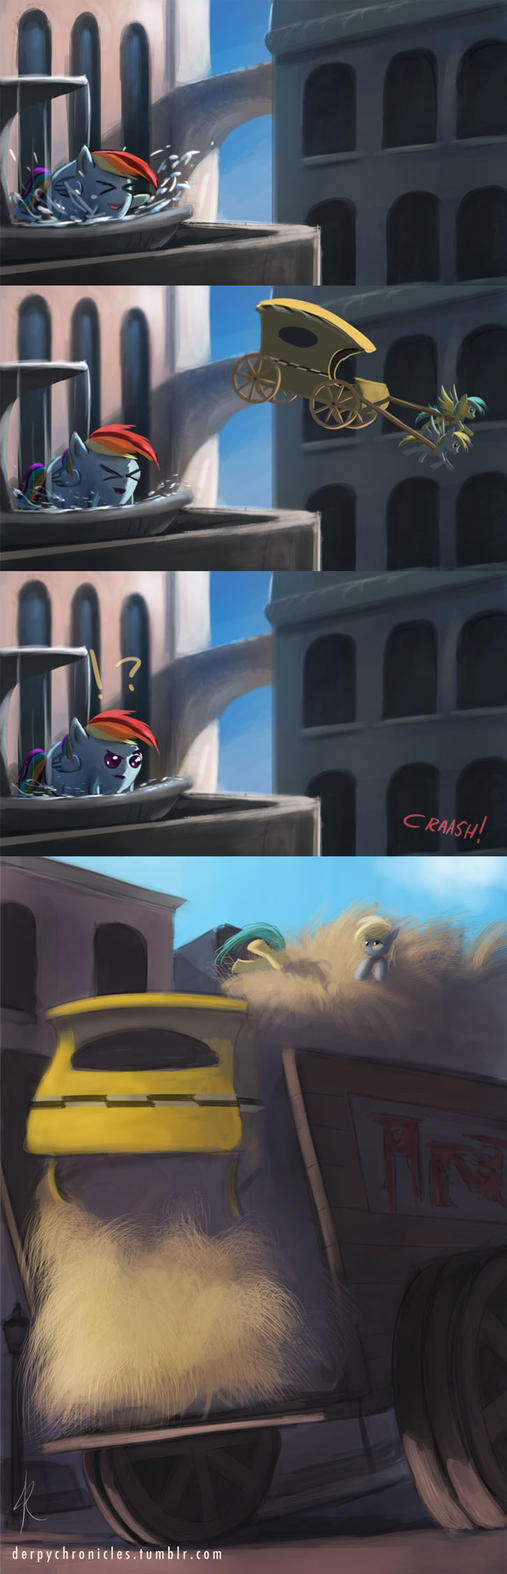 Derpy Chronicles - crash landing by Raikoh-illust